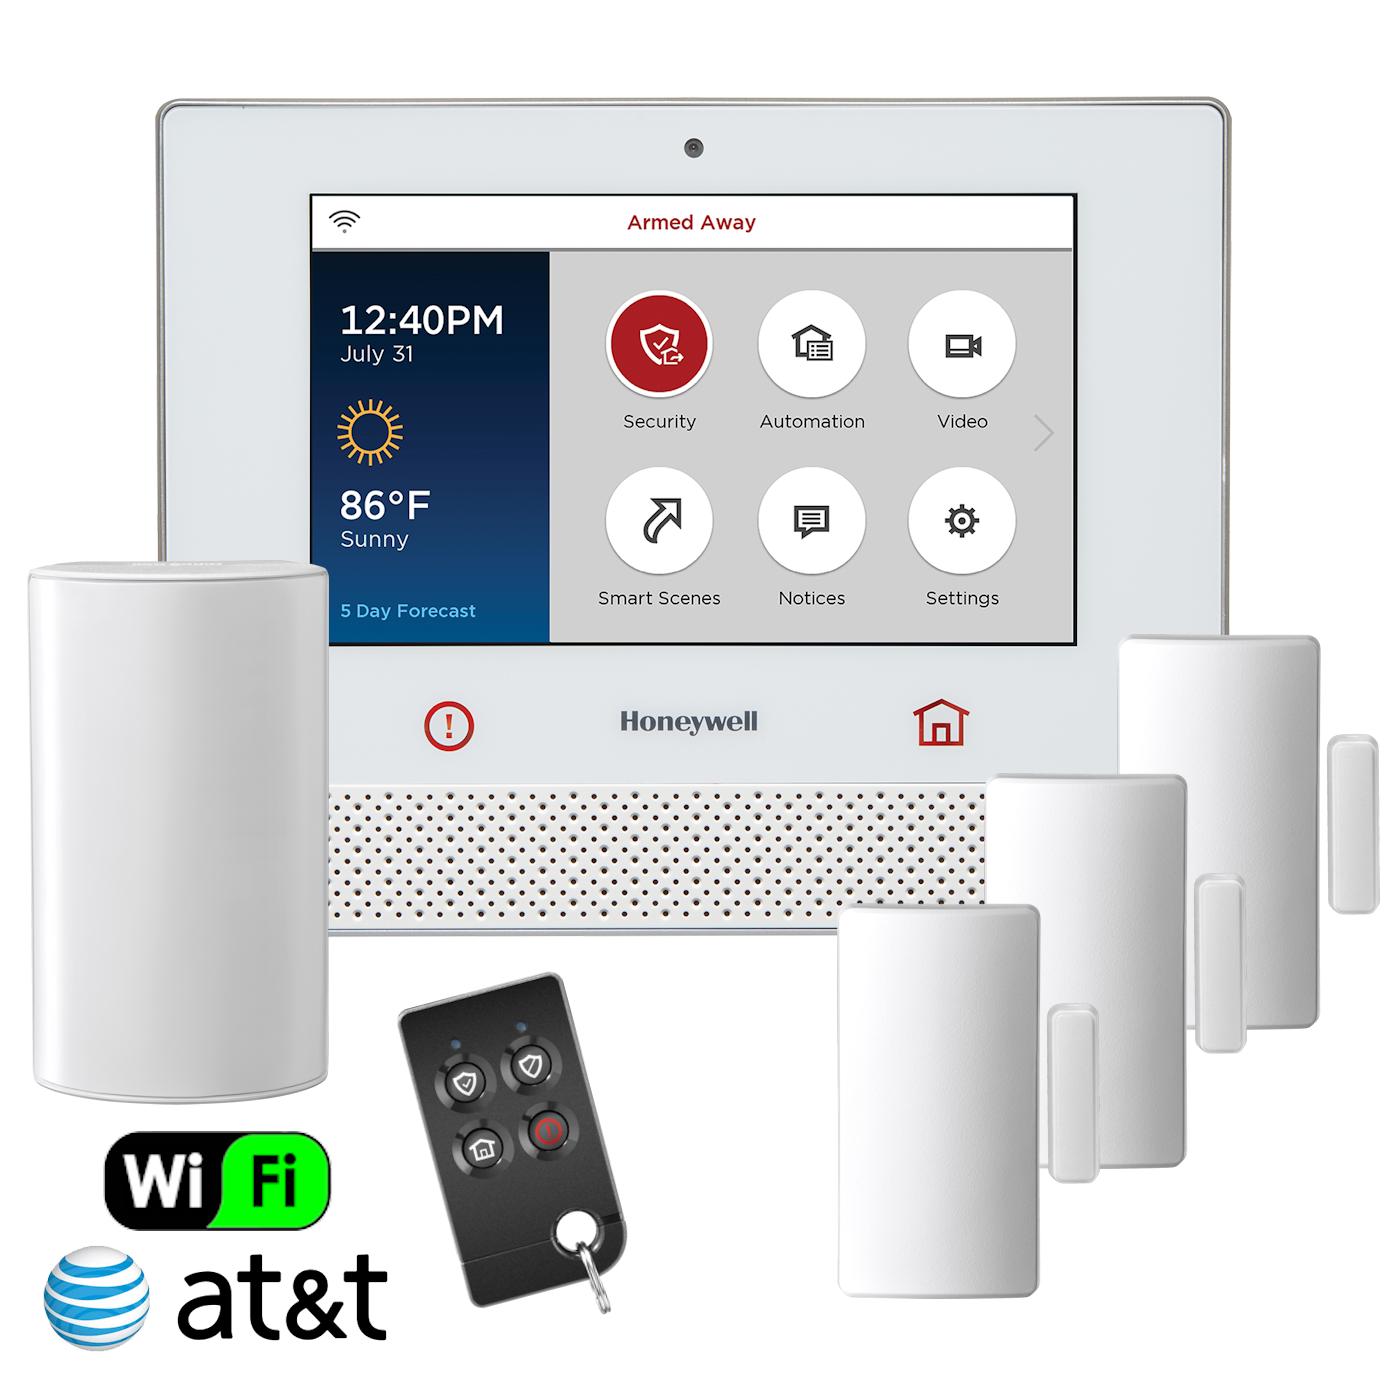 Ring Alarm Wireless Panic Button-4AP1S9-0EN0 - The Home Depot